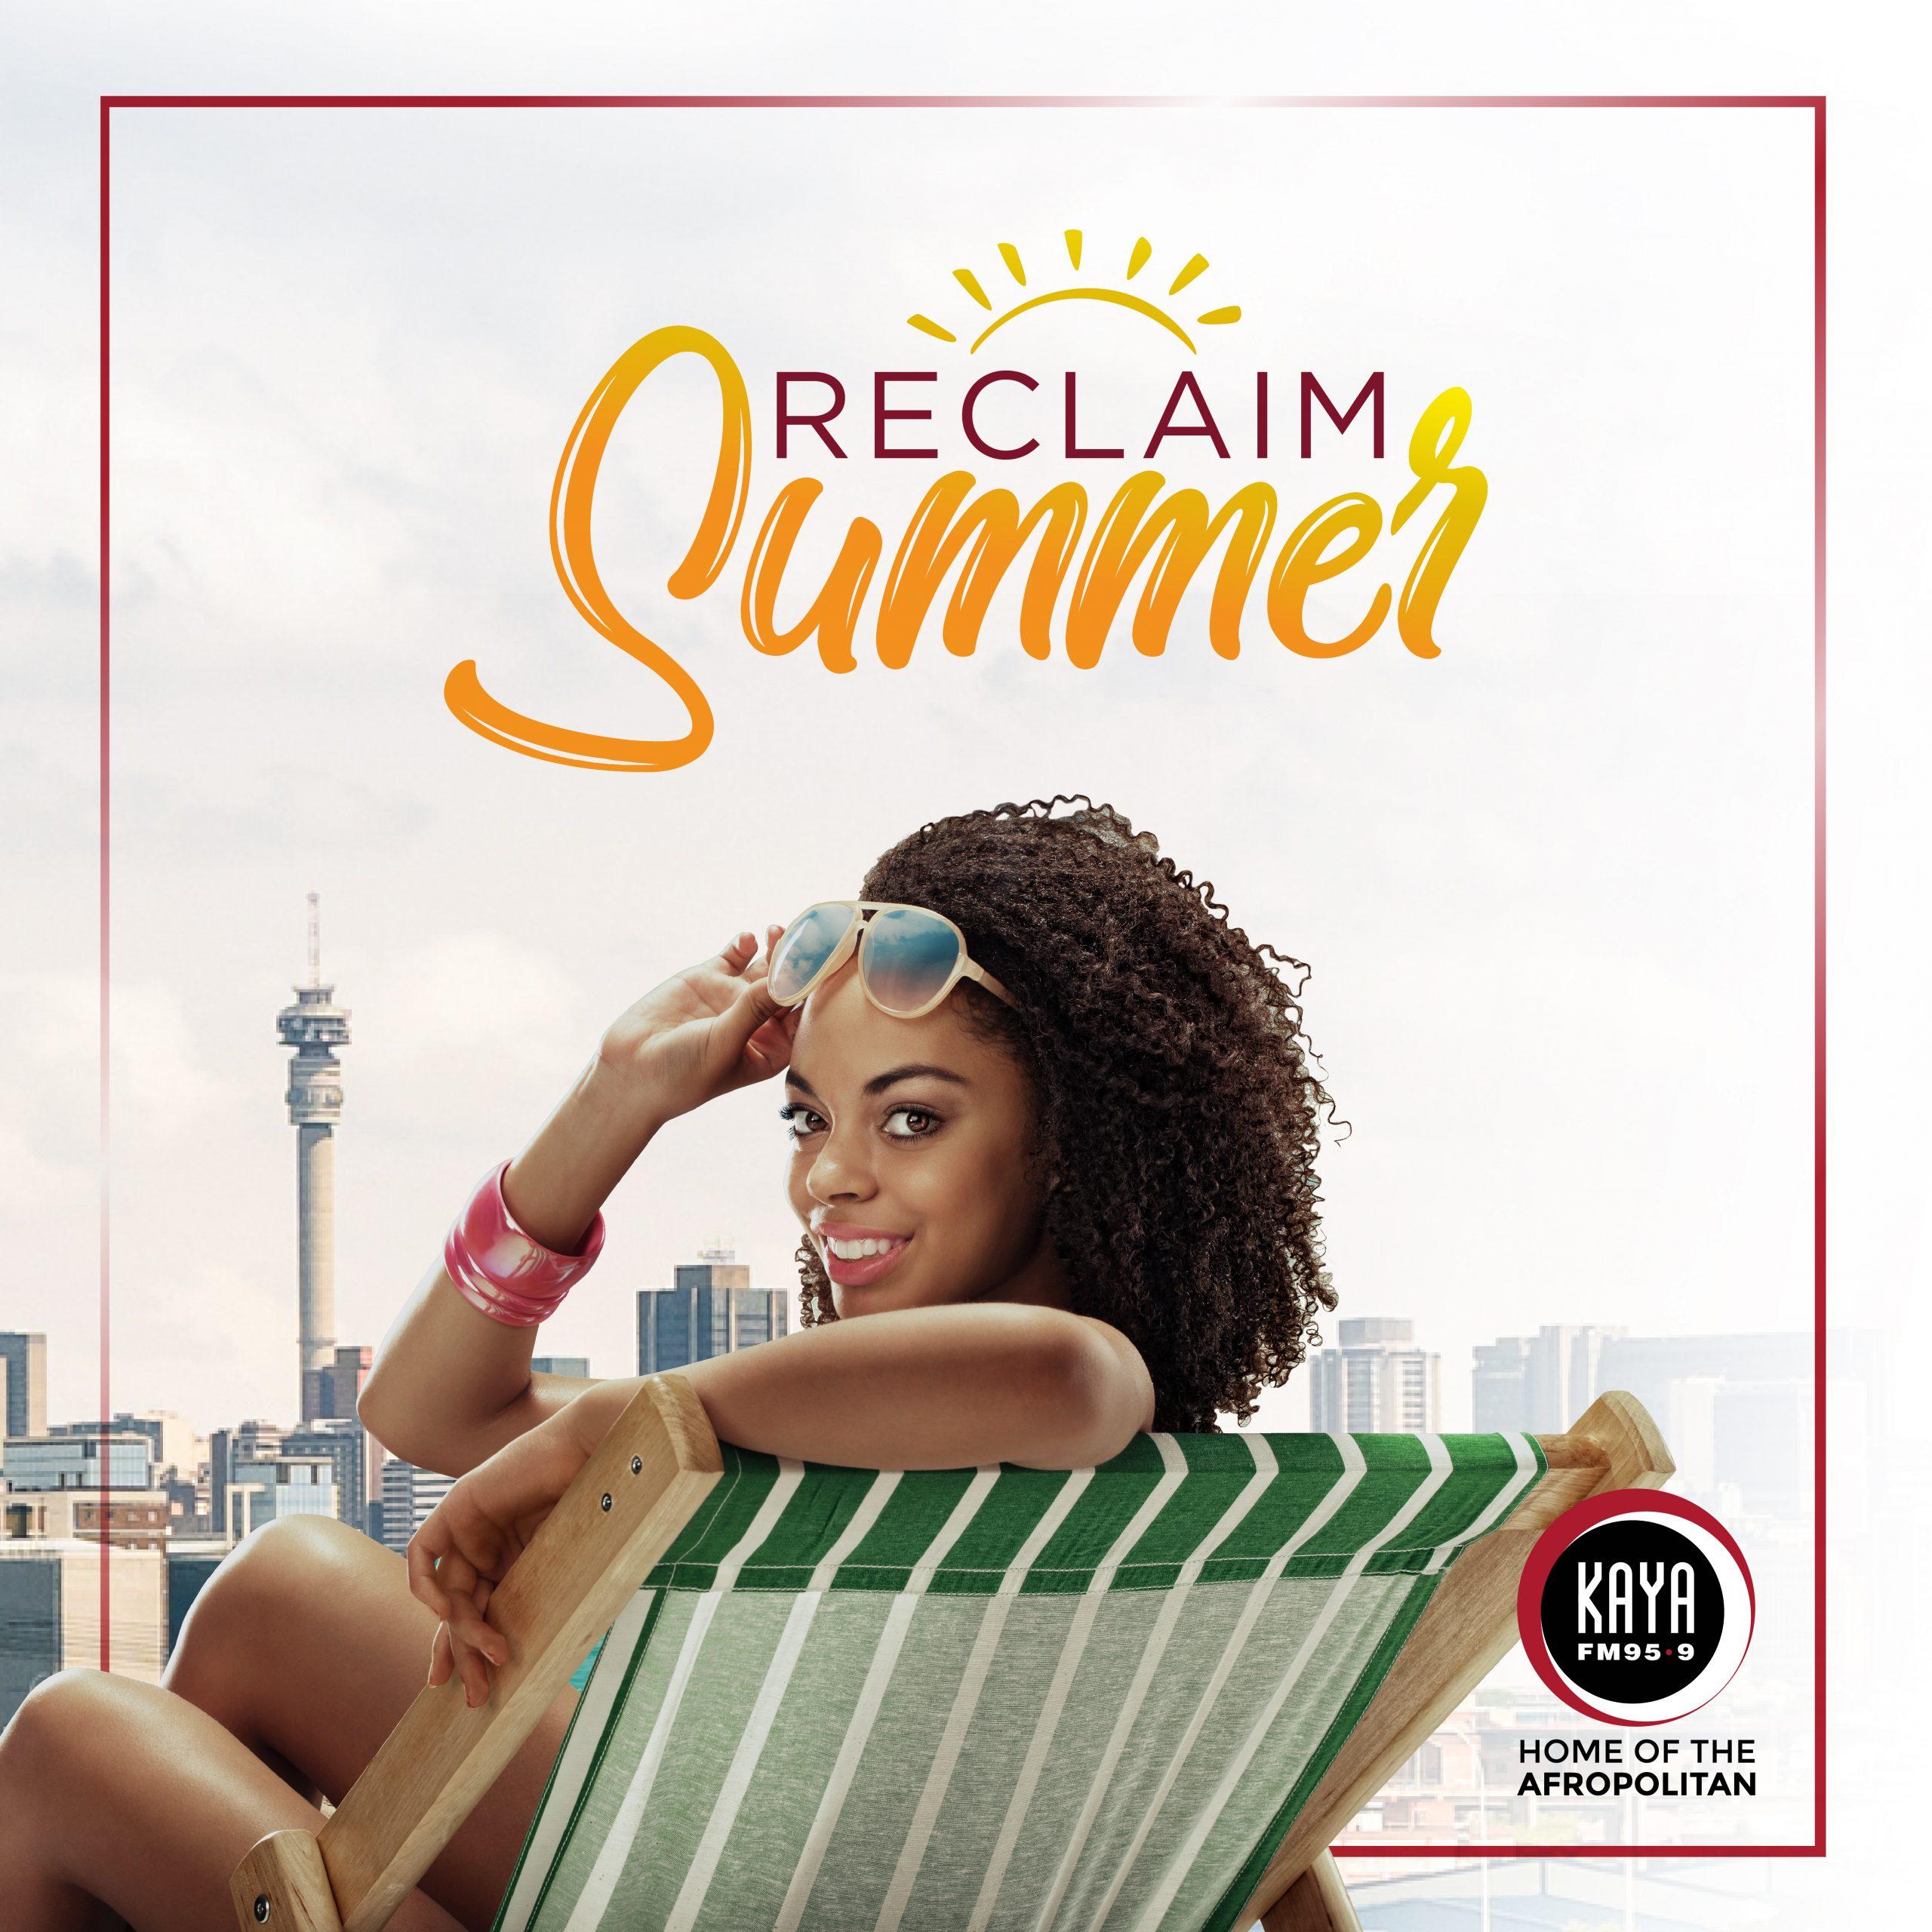 #reclaim summer, kaya book club, kaya events,